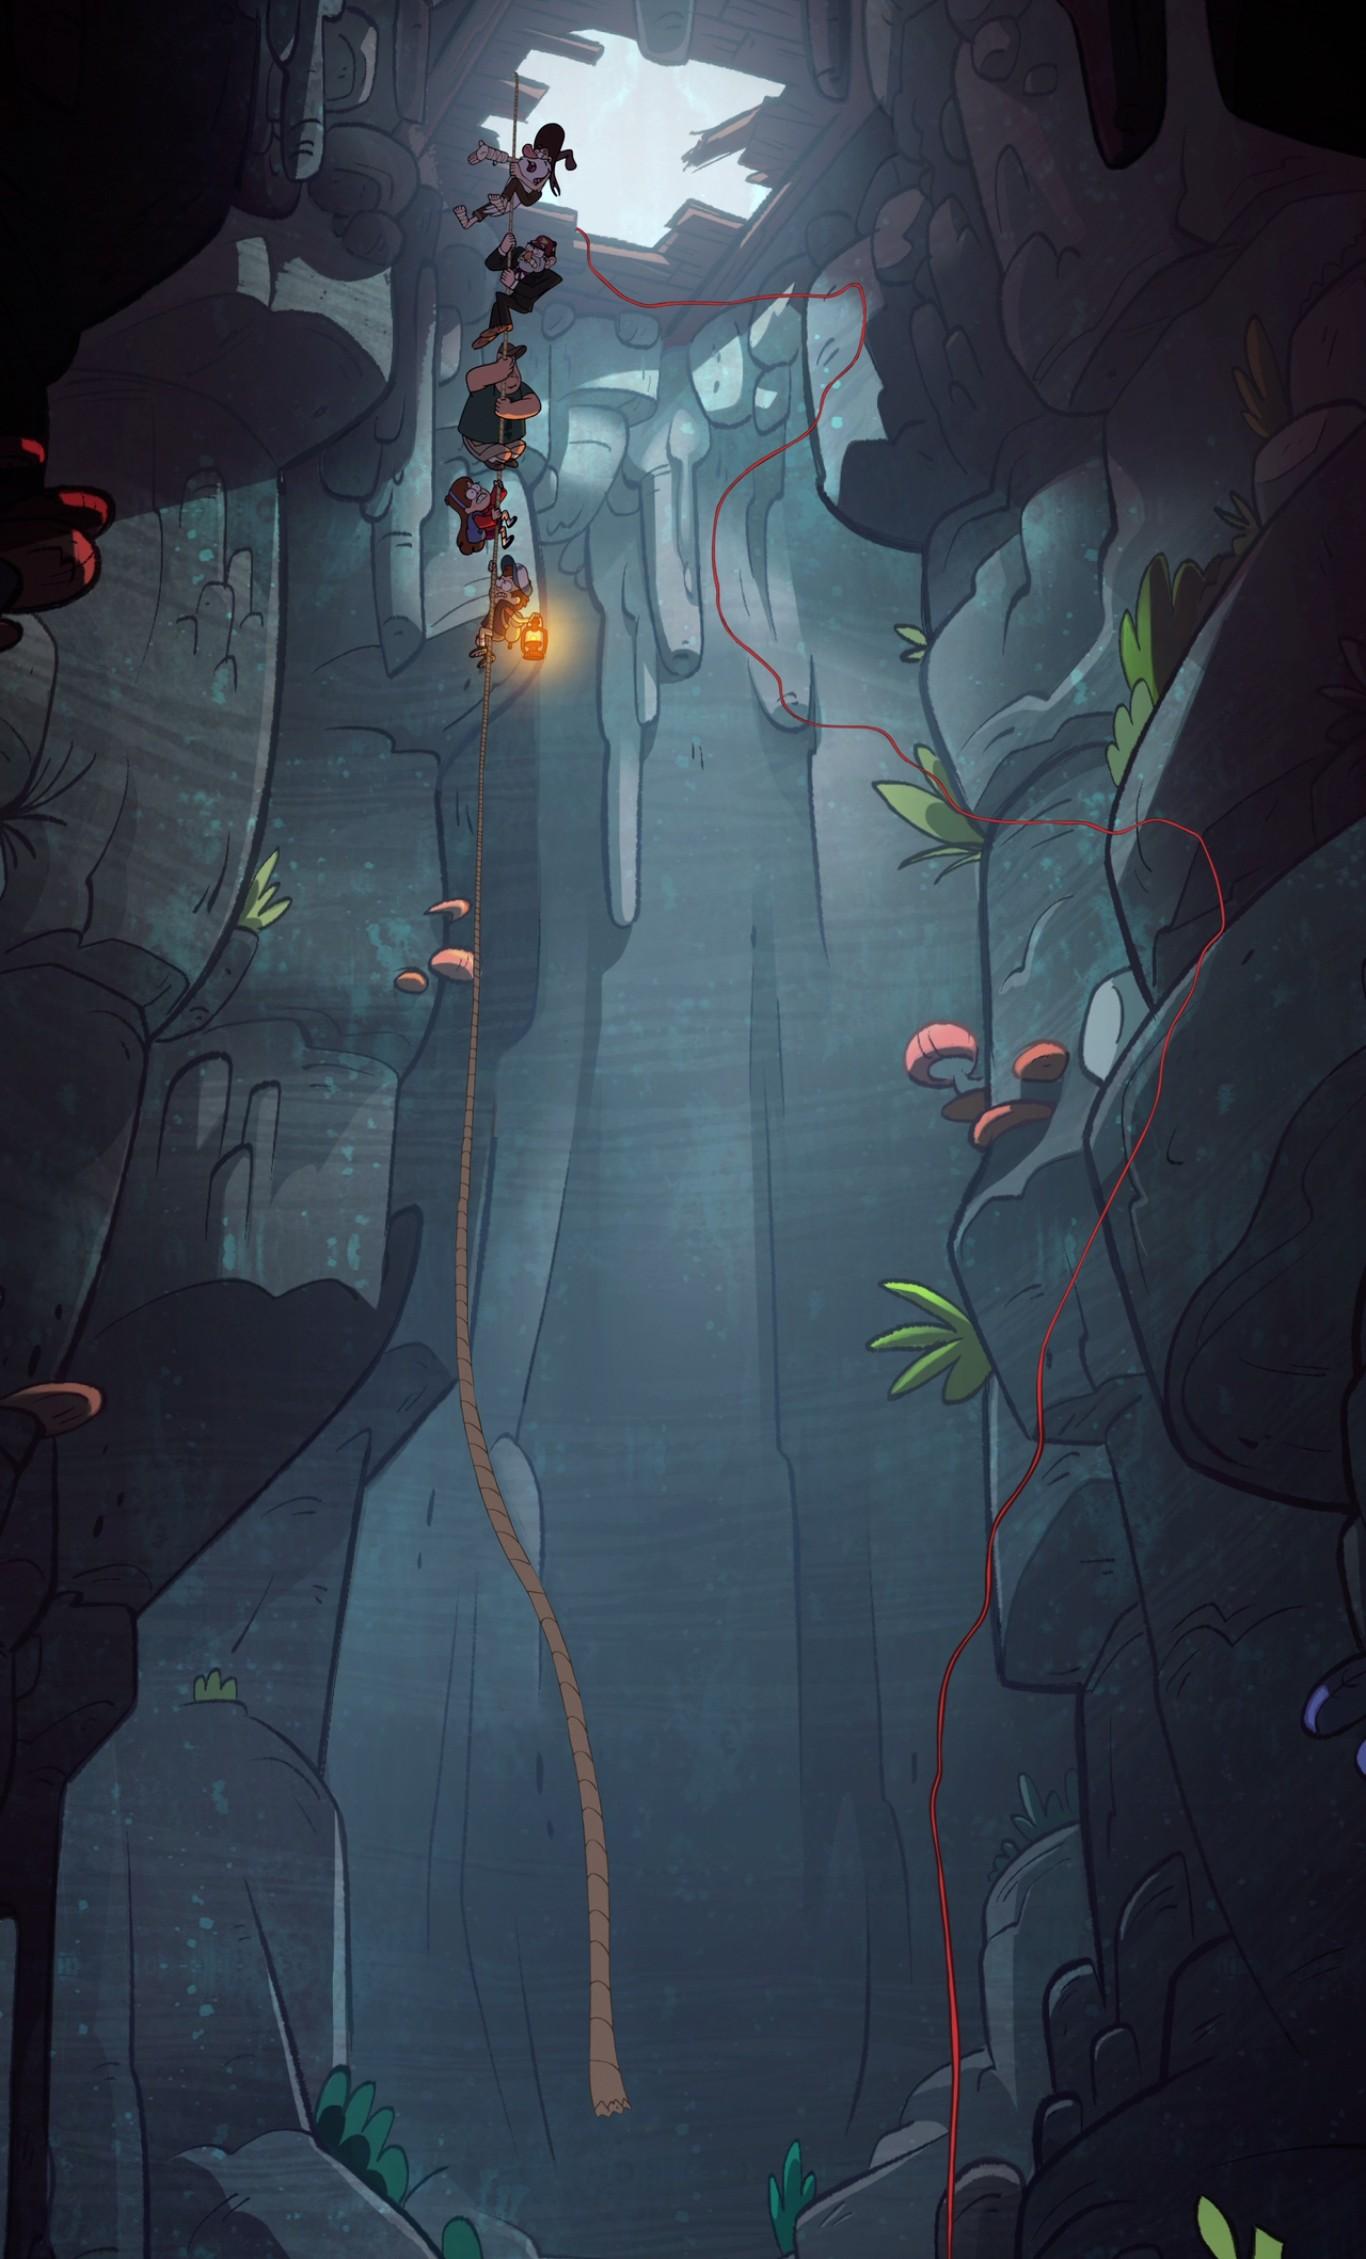 Wallpaper Gravity Falls Hd 59 Gravity Falls Backgrounds 183 ① Download Free Amazing Hd